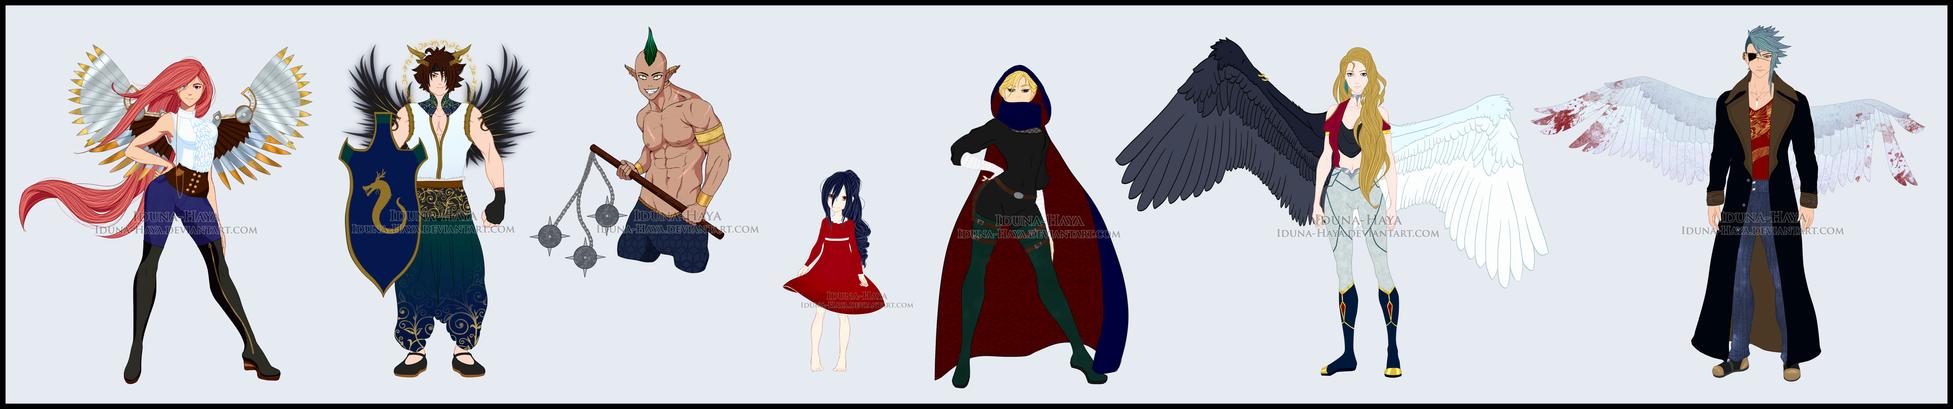 Character Designs 2017.1 by Iduna-Haya